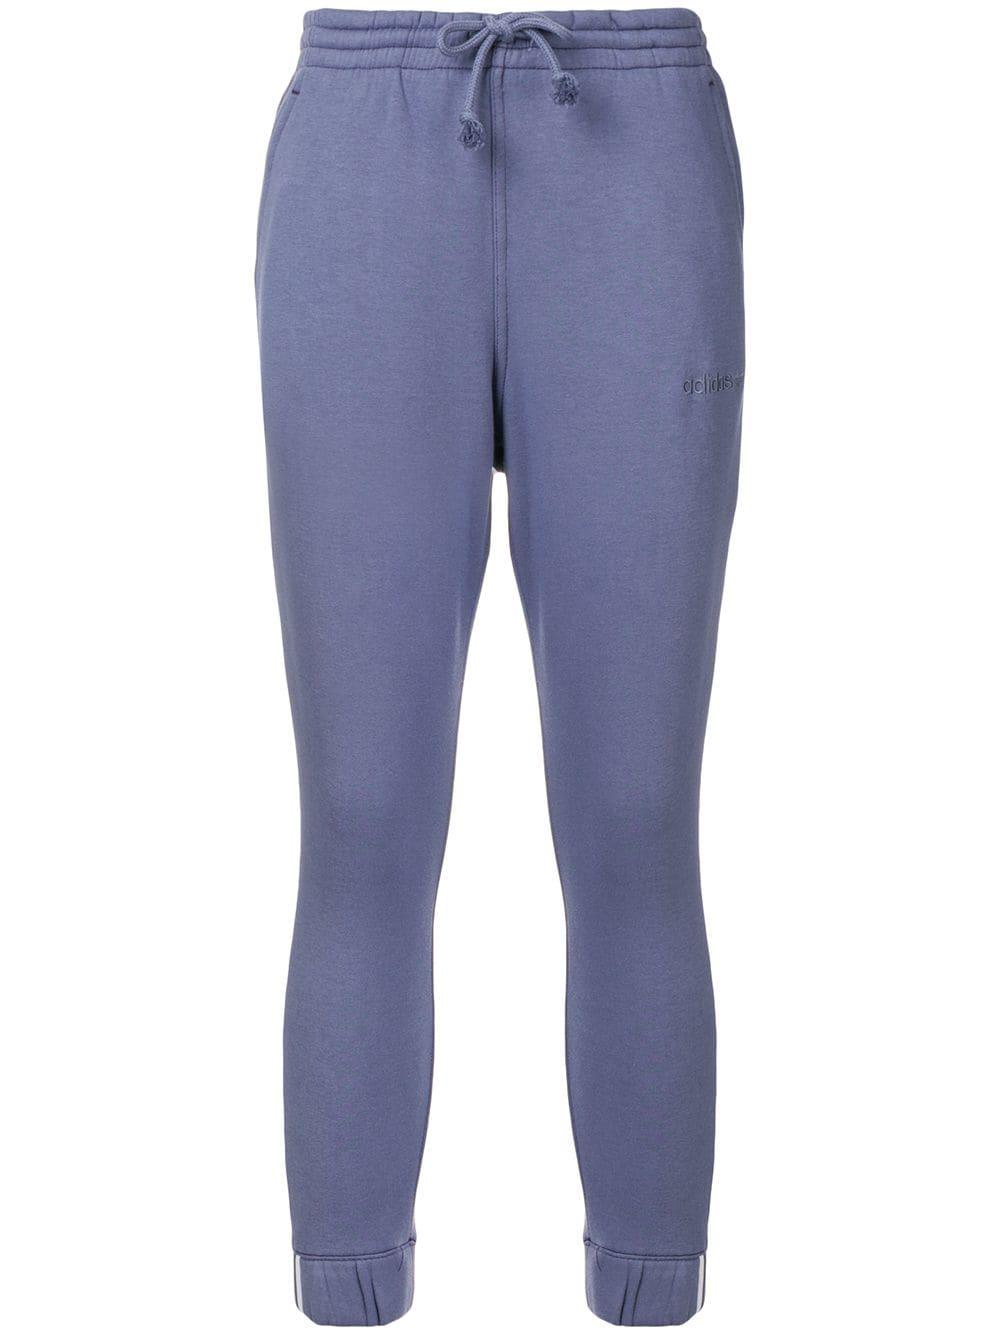 bc76a66b47e Adidas Coeeze trousers - Blue - Glami.cz